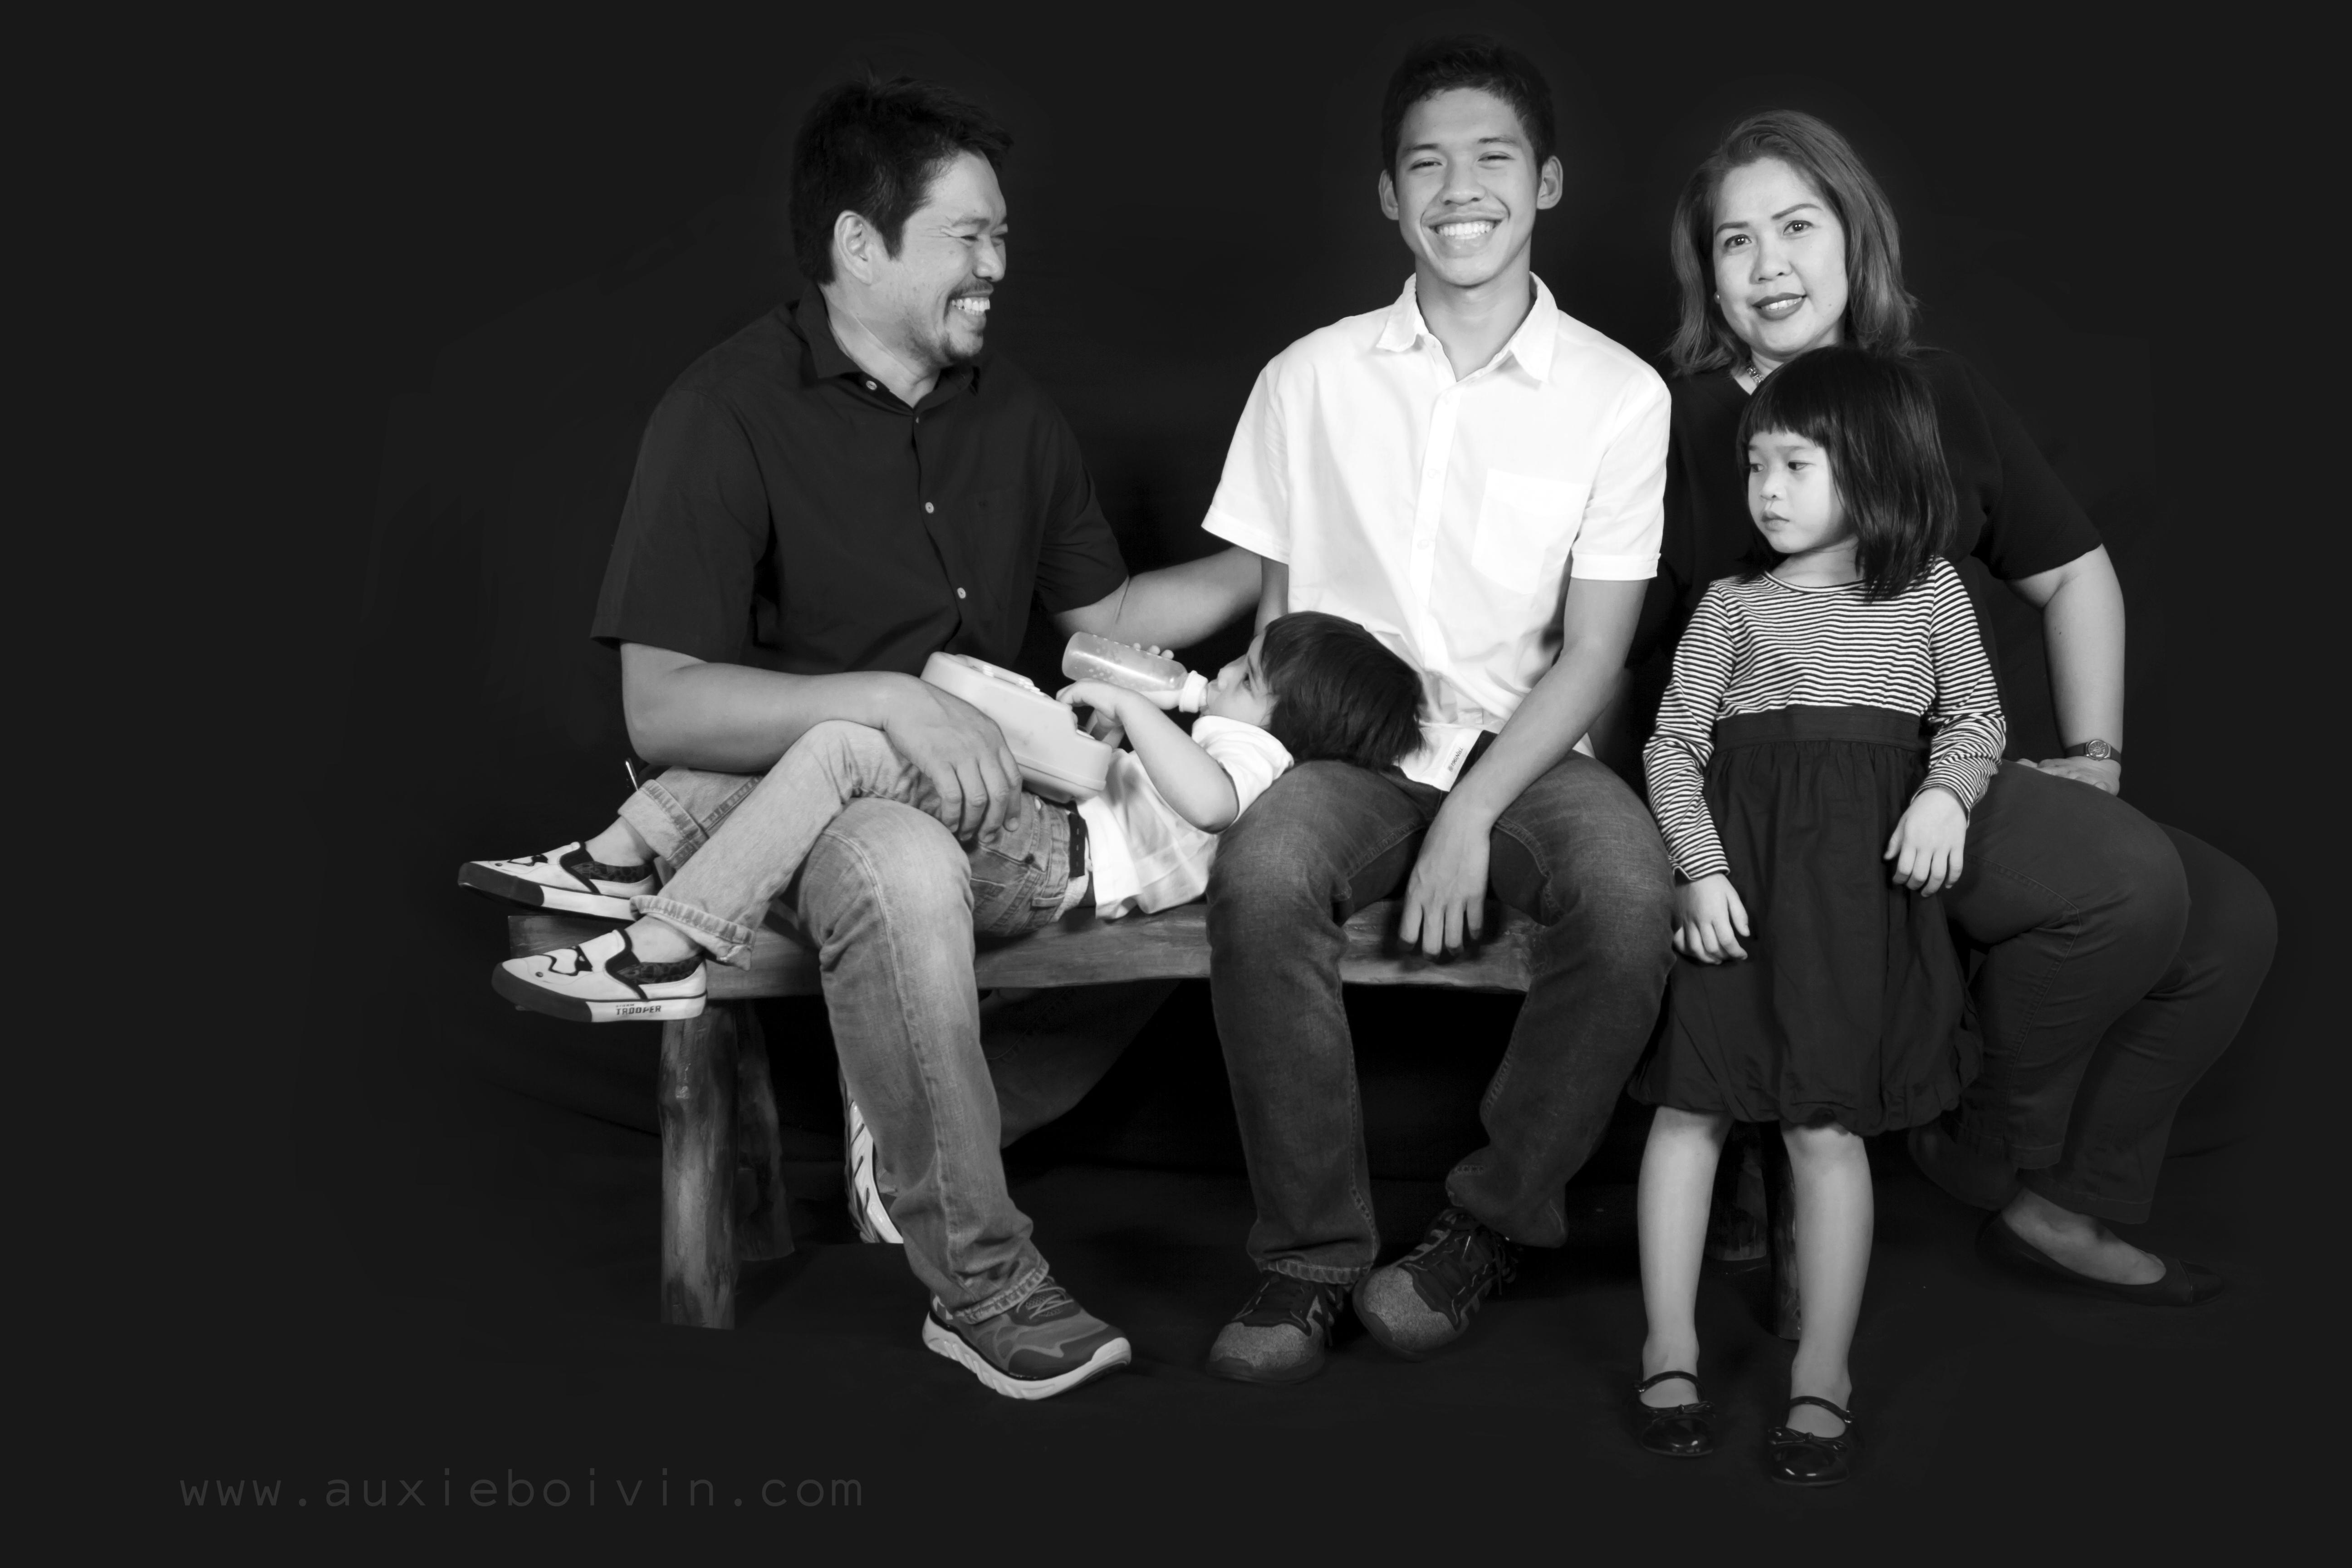 Avila Family